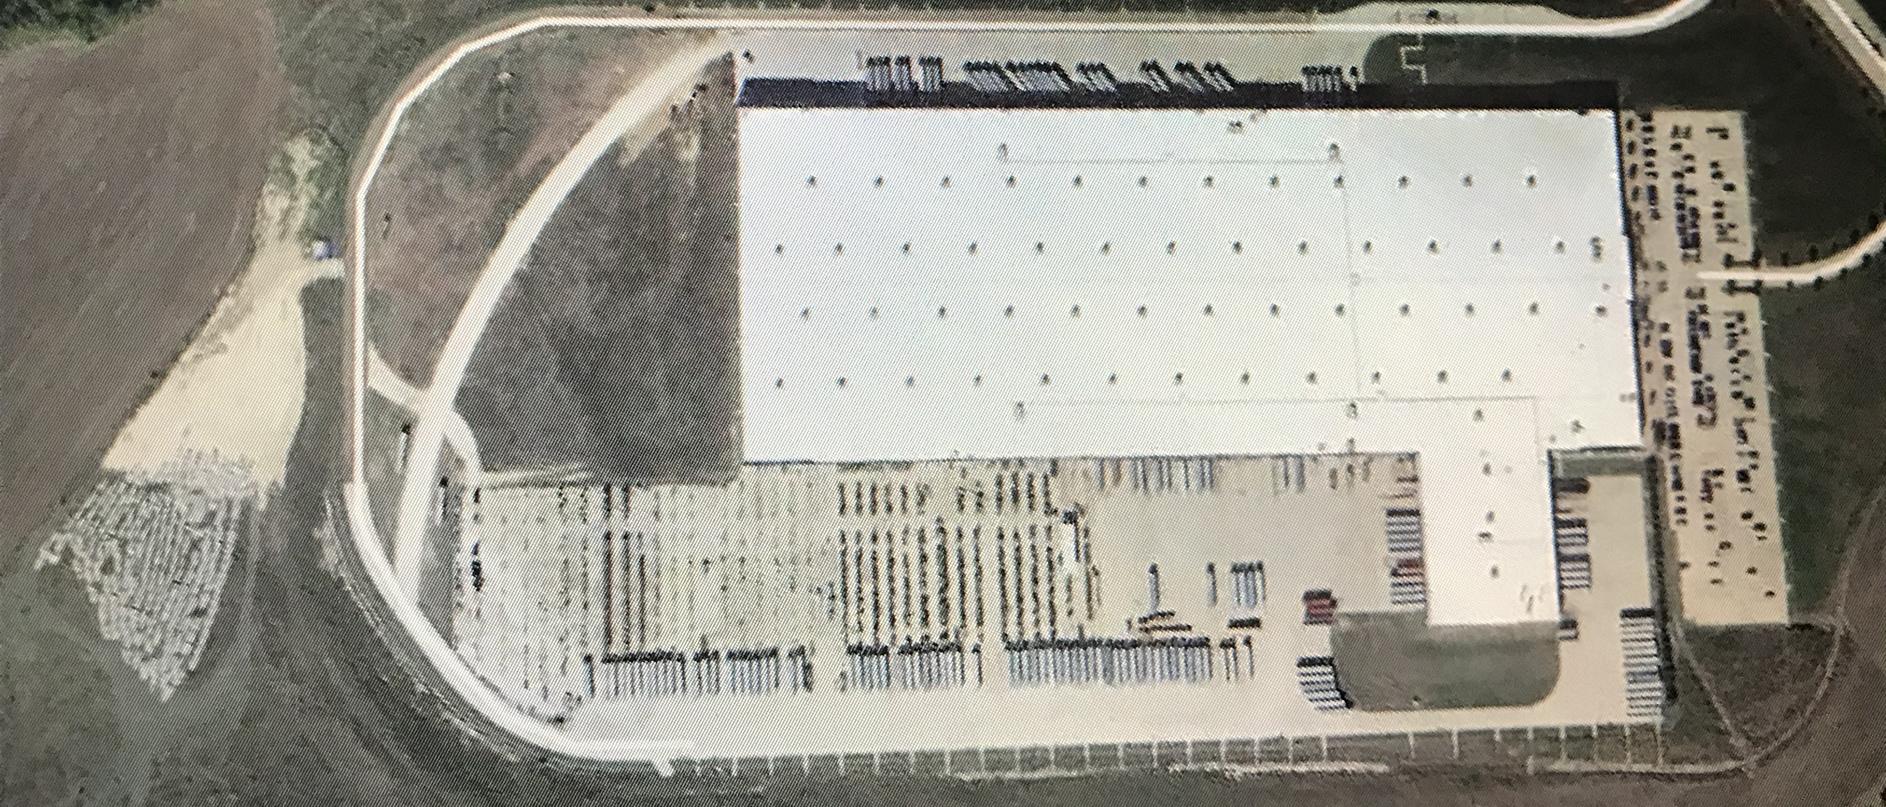 Brazos Environmental & Engineering Services Waco - Catarpillar Inc Facility